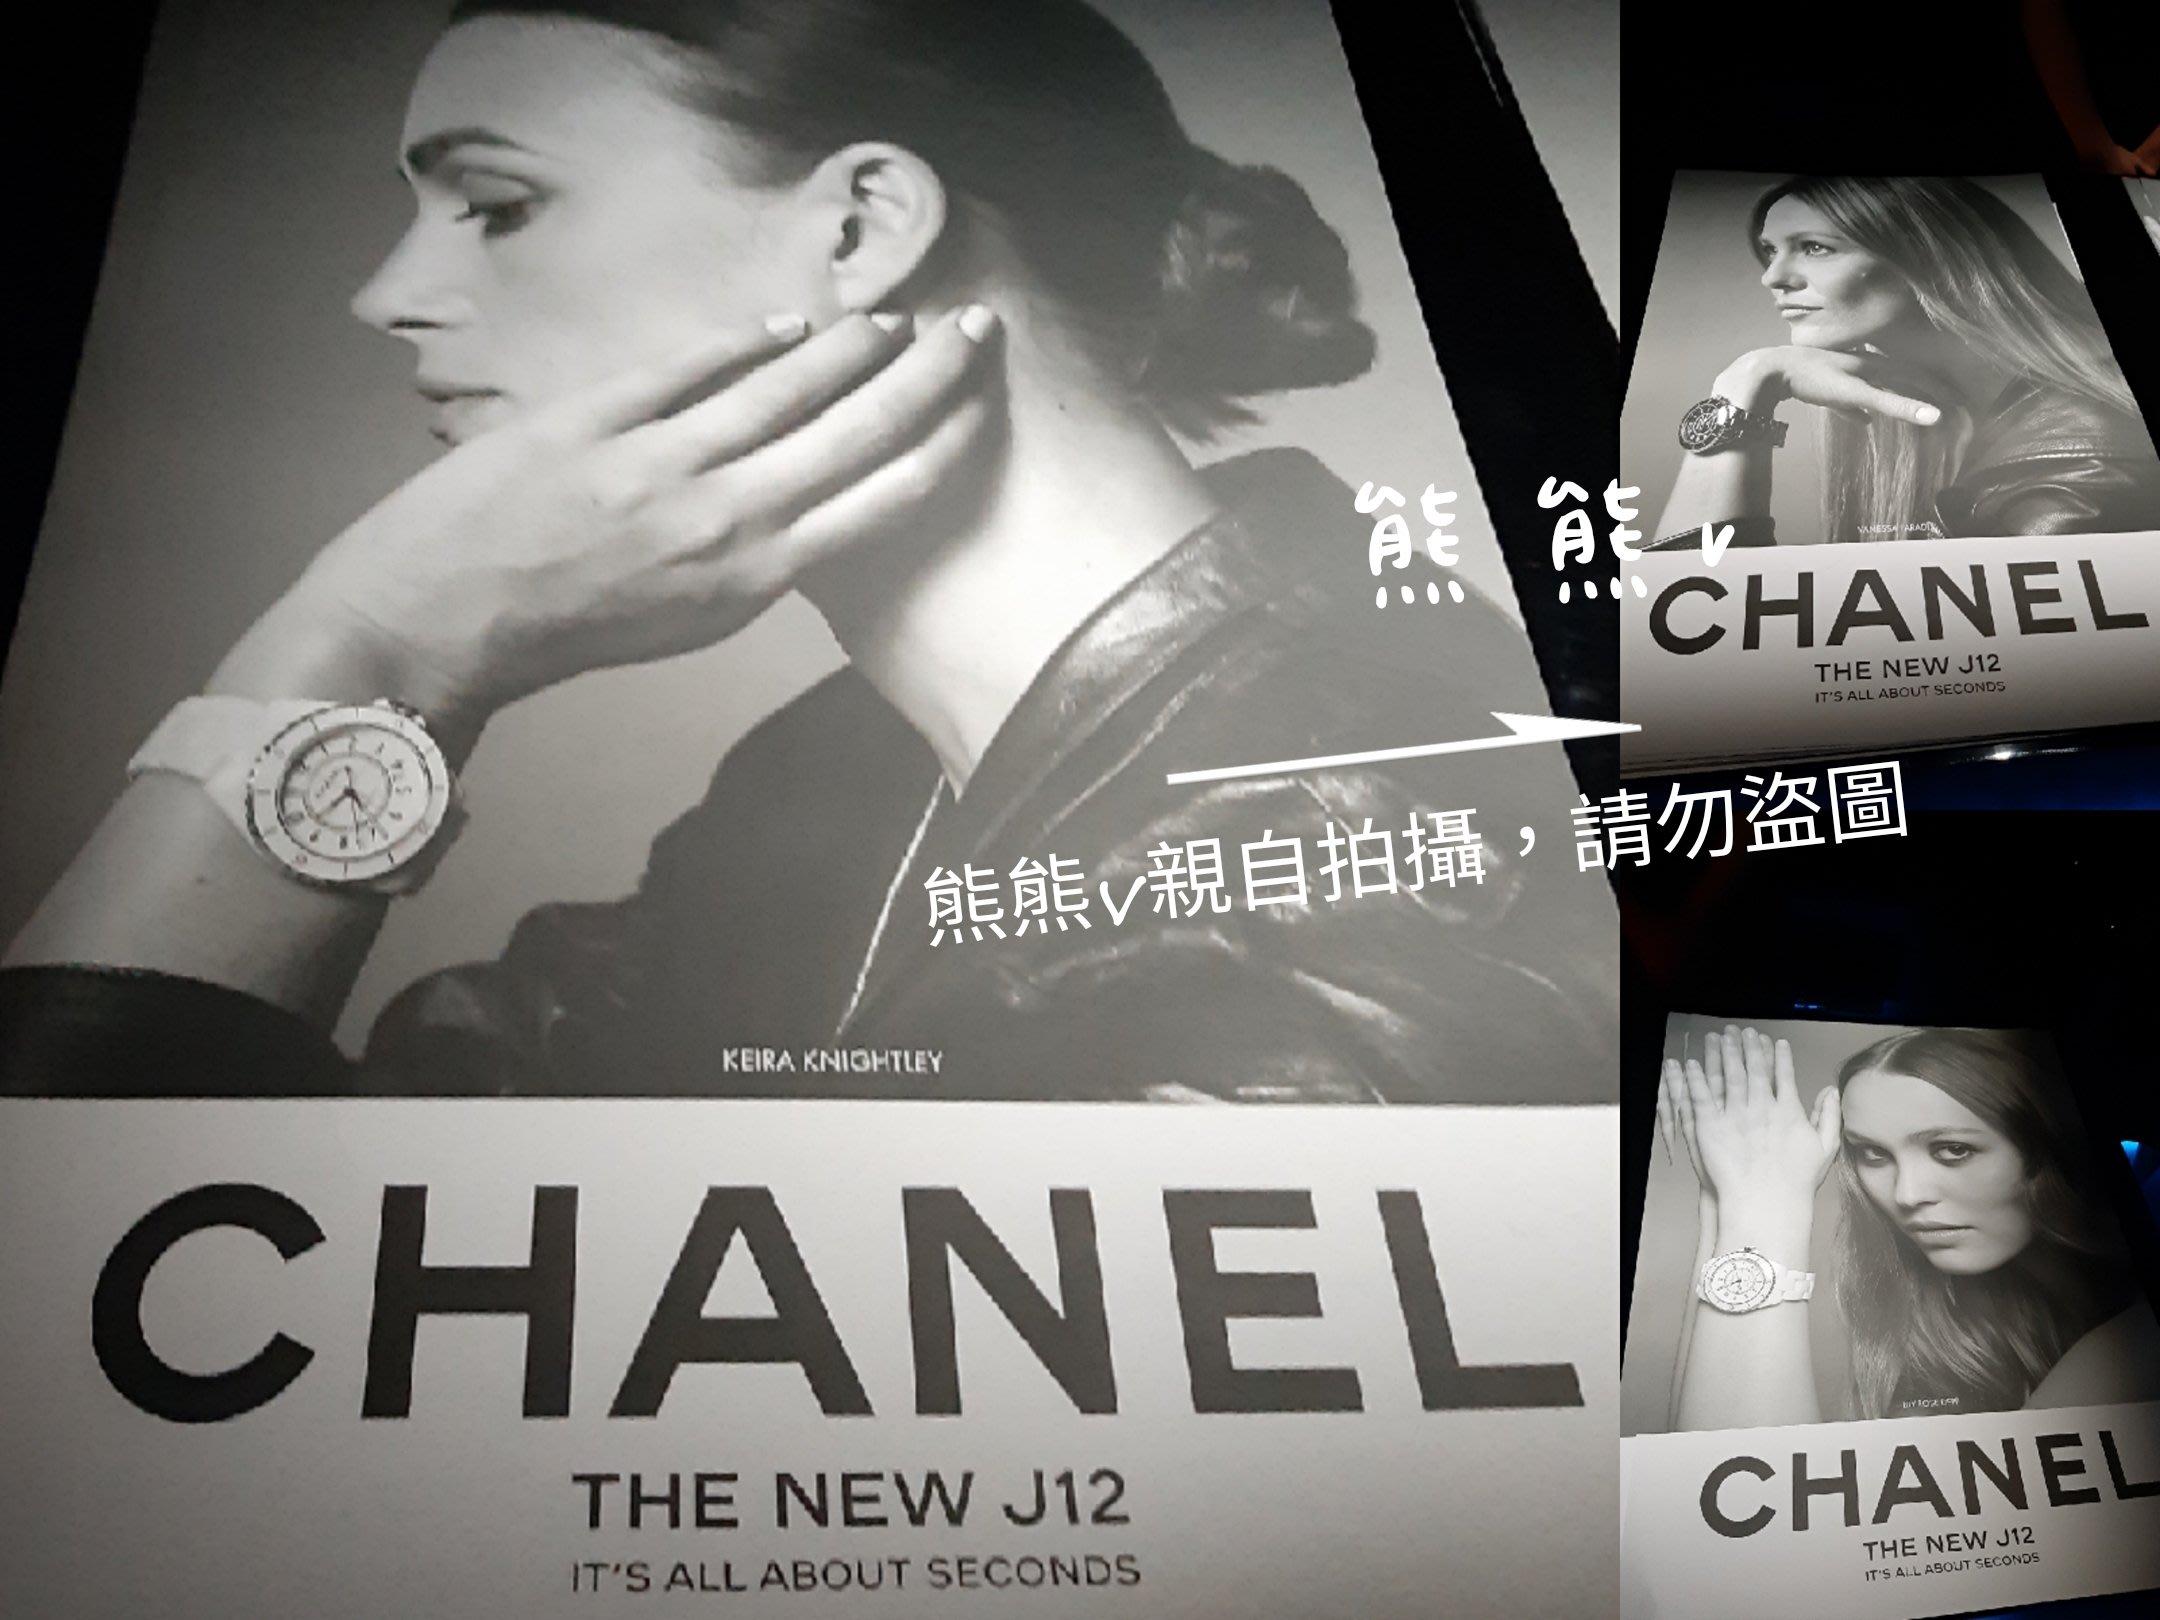 《♠️熊熊v》香奈兒 CHANEL J12 限量海報「Decisive Seconds」陶瓷錶 THE NEW J12